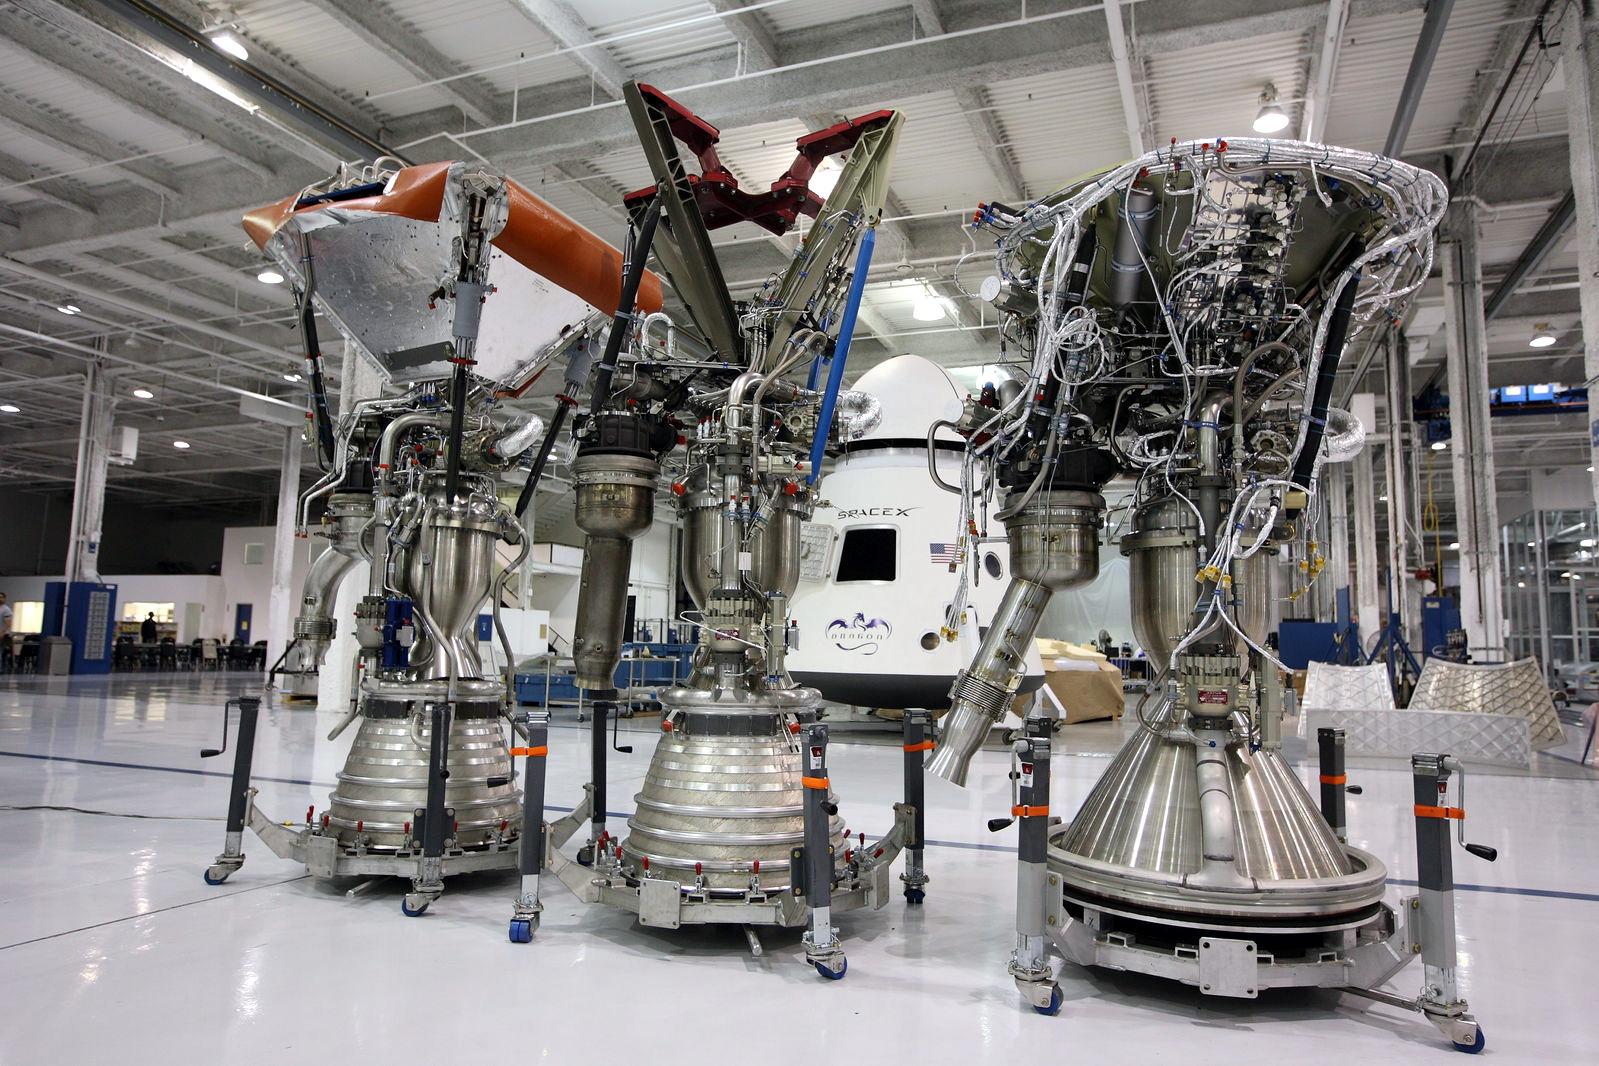 spacex hawthorne rocket - HD1599×1066